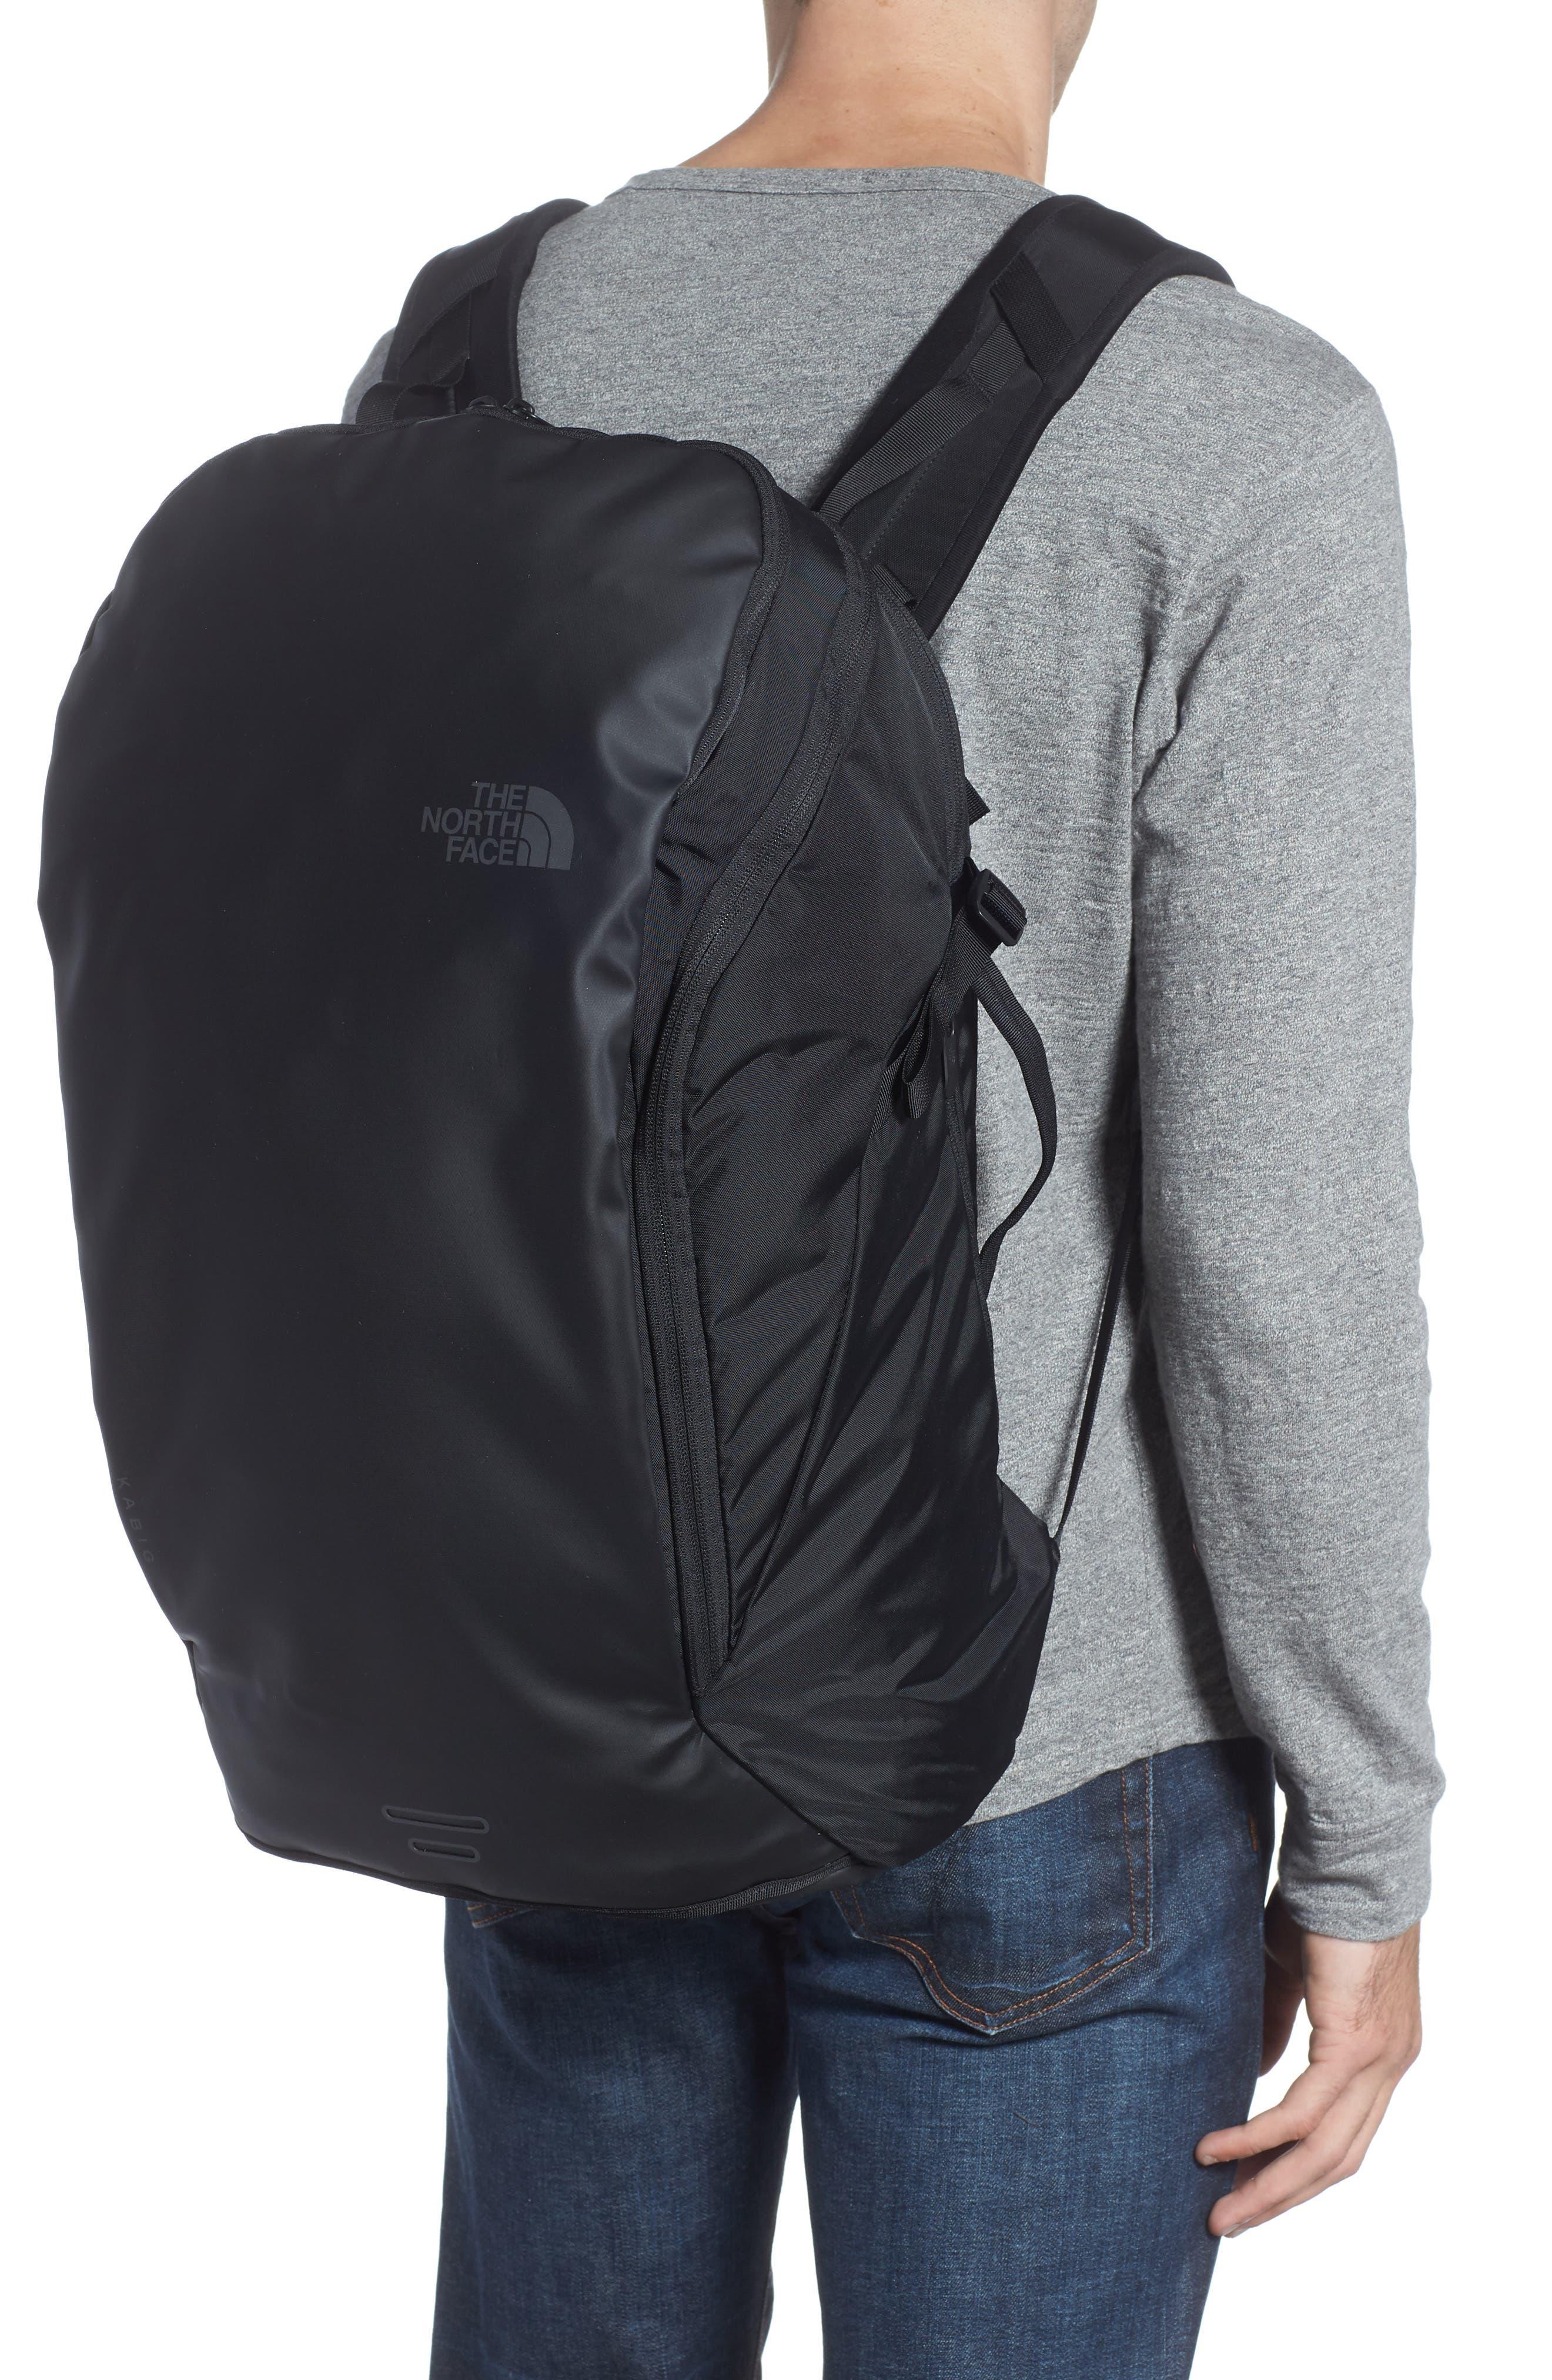 Kabig Backpack,                             Alternate thumbnail 2, color,                             001